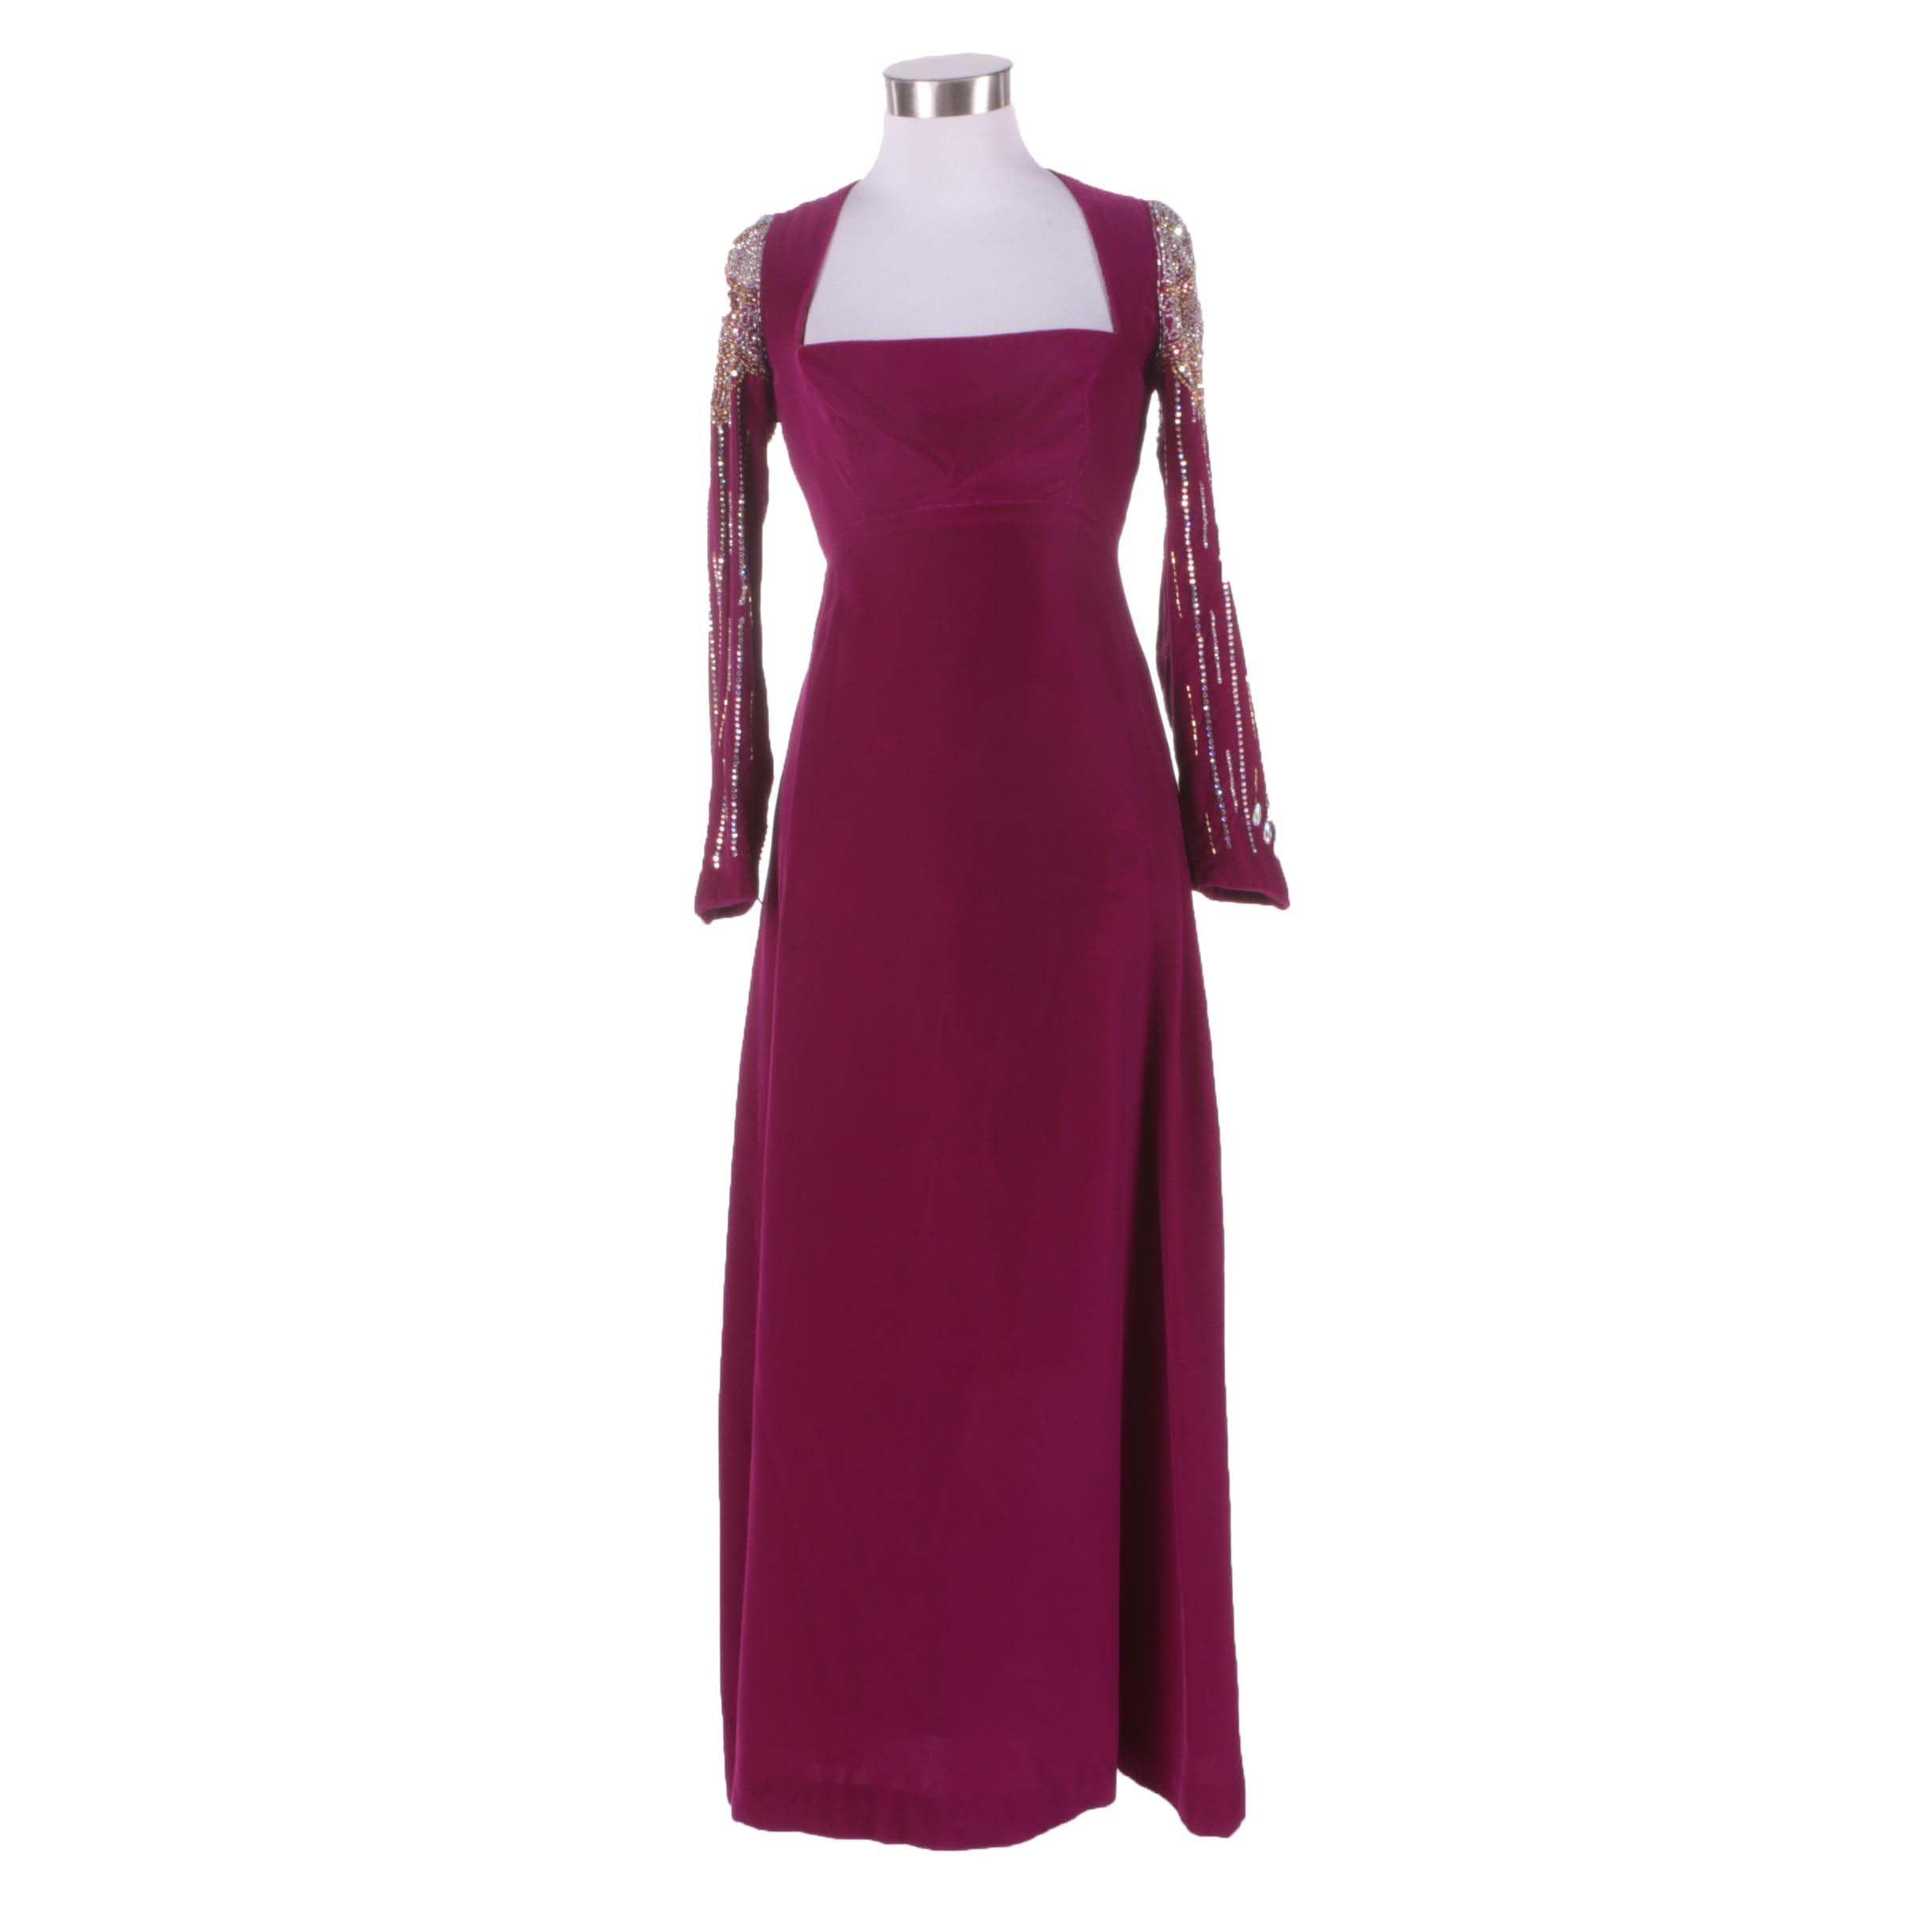 1960s Vintage Mr. Blackwell Custom Embellished Purple Velvet Evening Dress